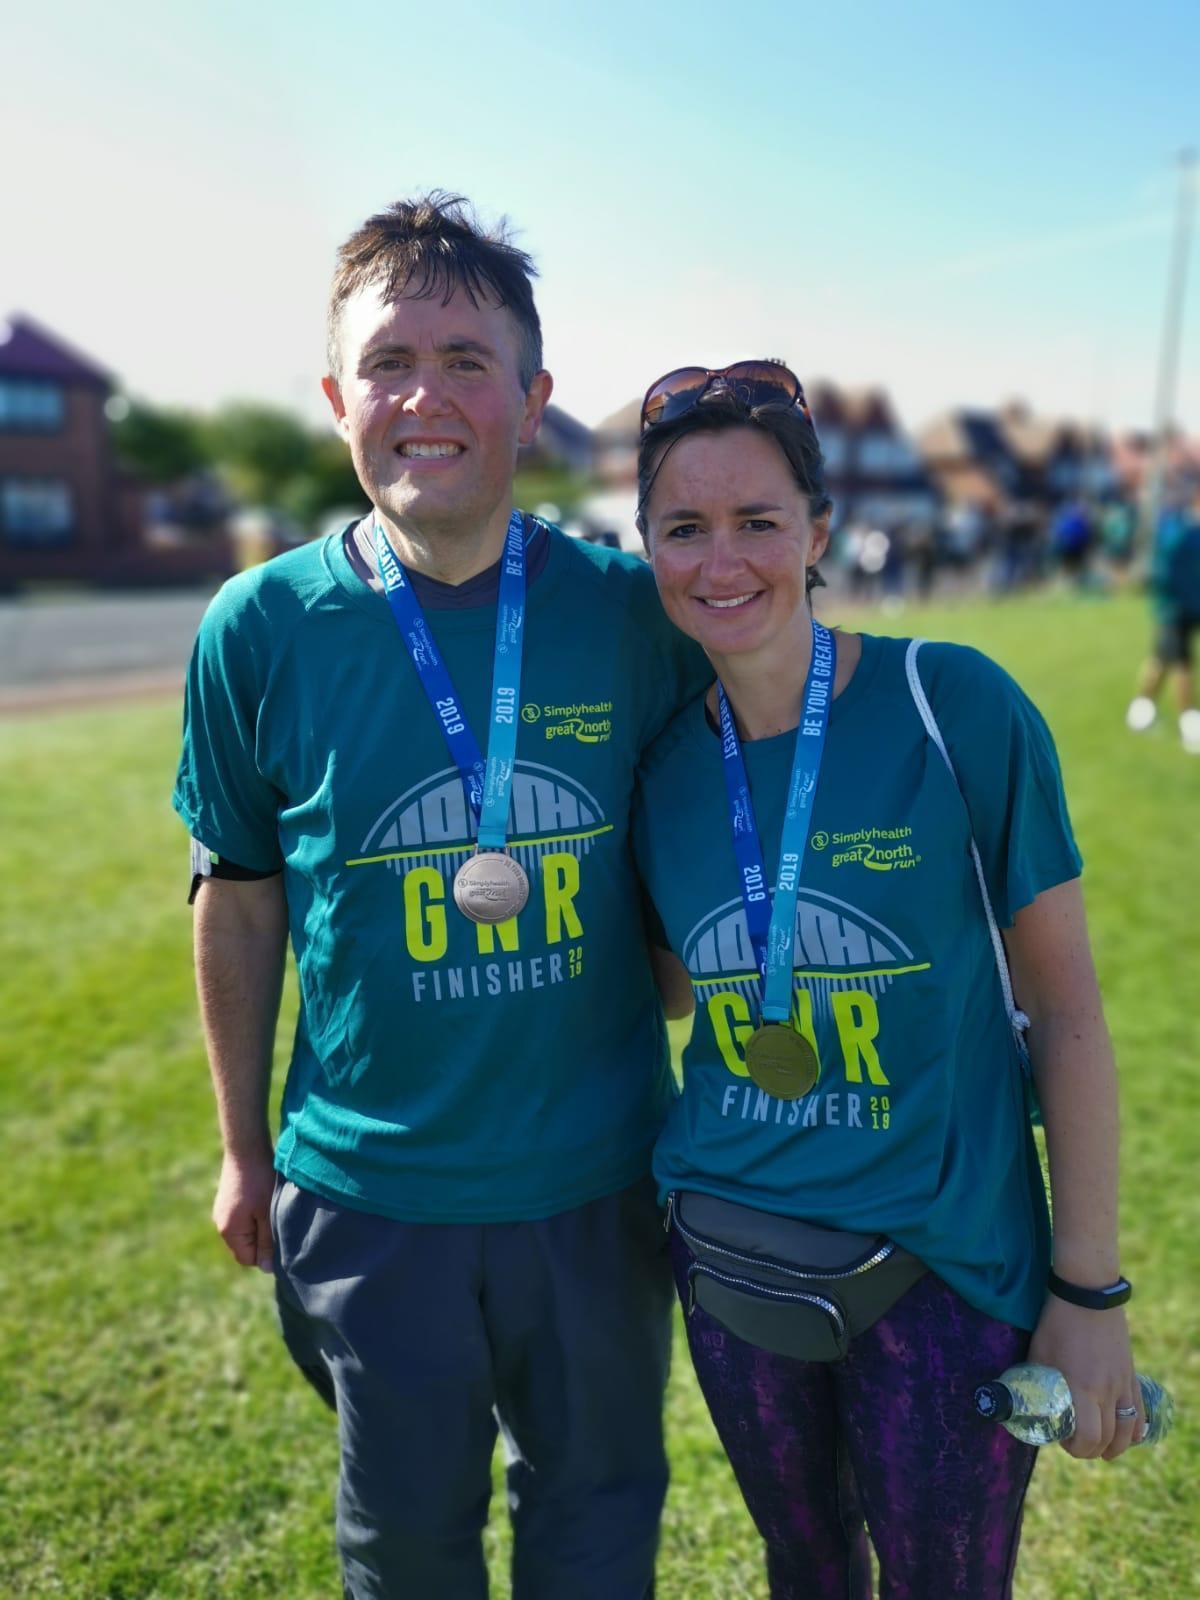 Super slimmer who lost 17st completes Great North Run half-marathon